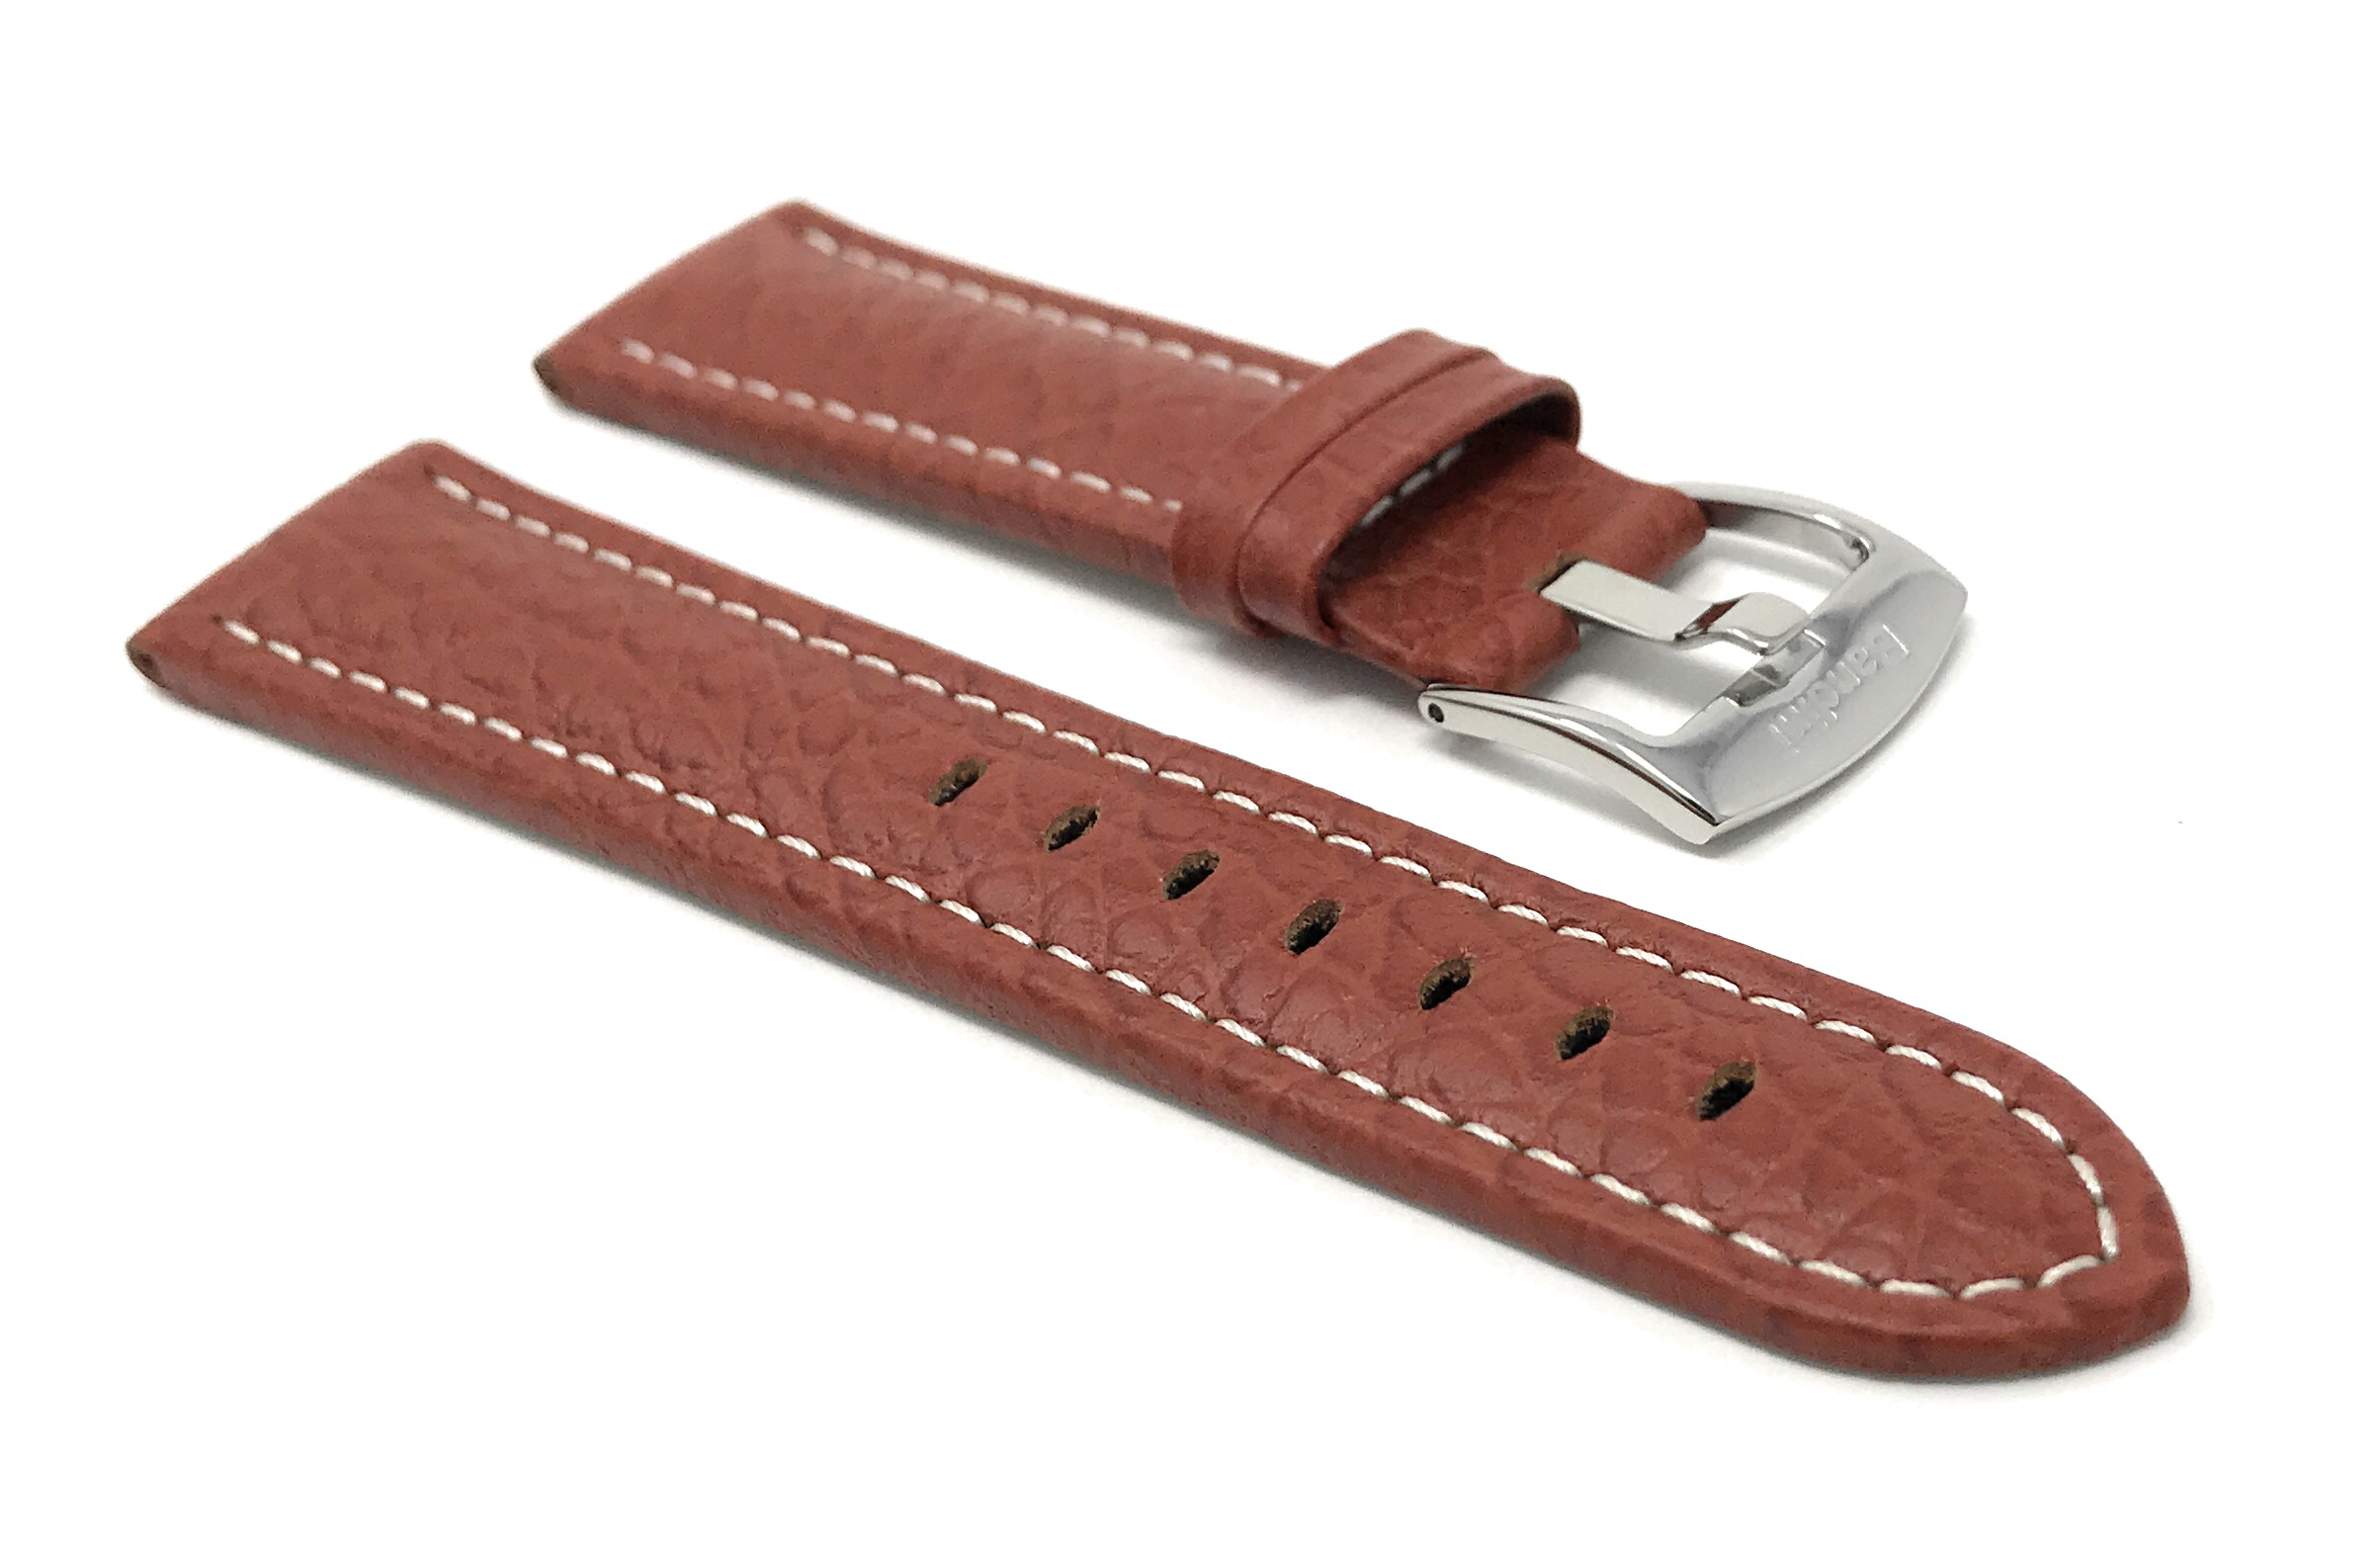 Bandini-Watch-Band-Leather-Strap-Buffalo-Pattern-18mm-30mm-Extra-Long-Also thumbnail 23